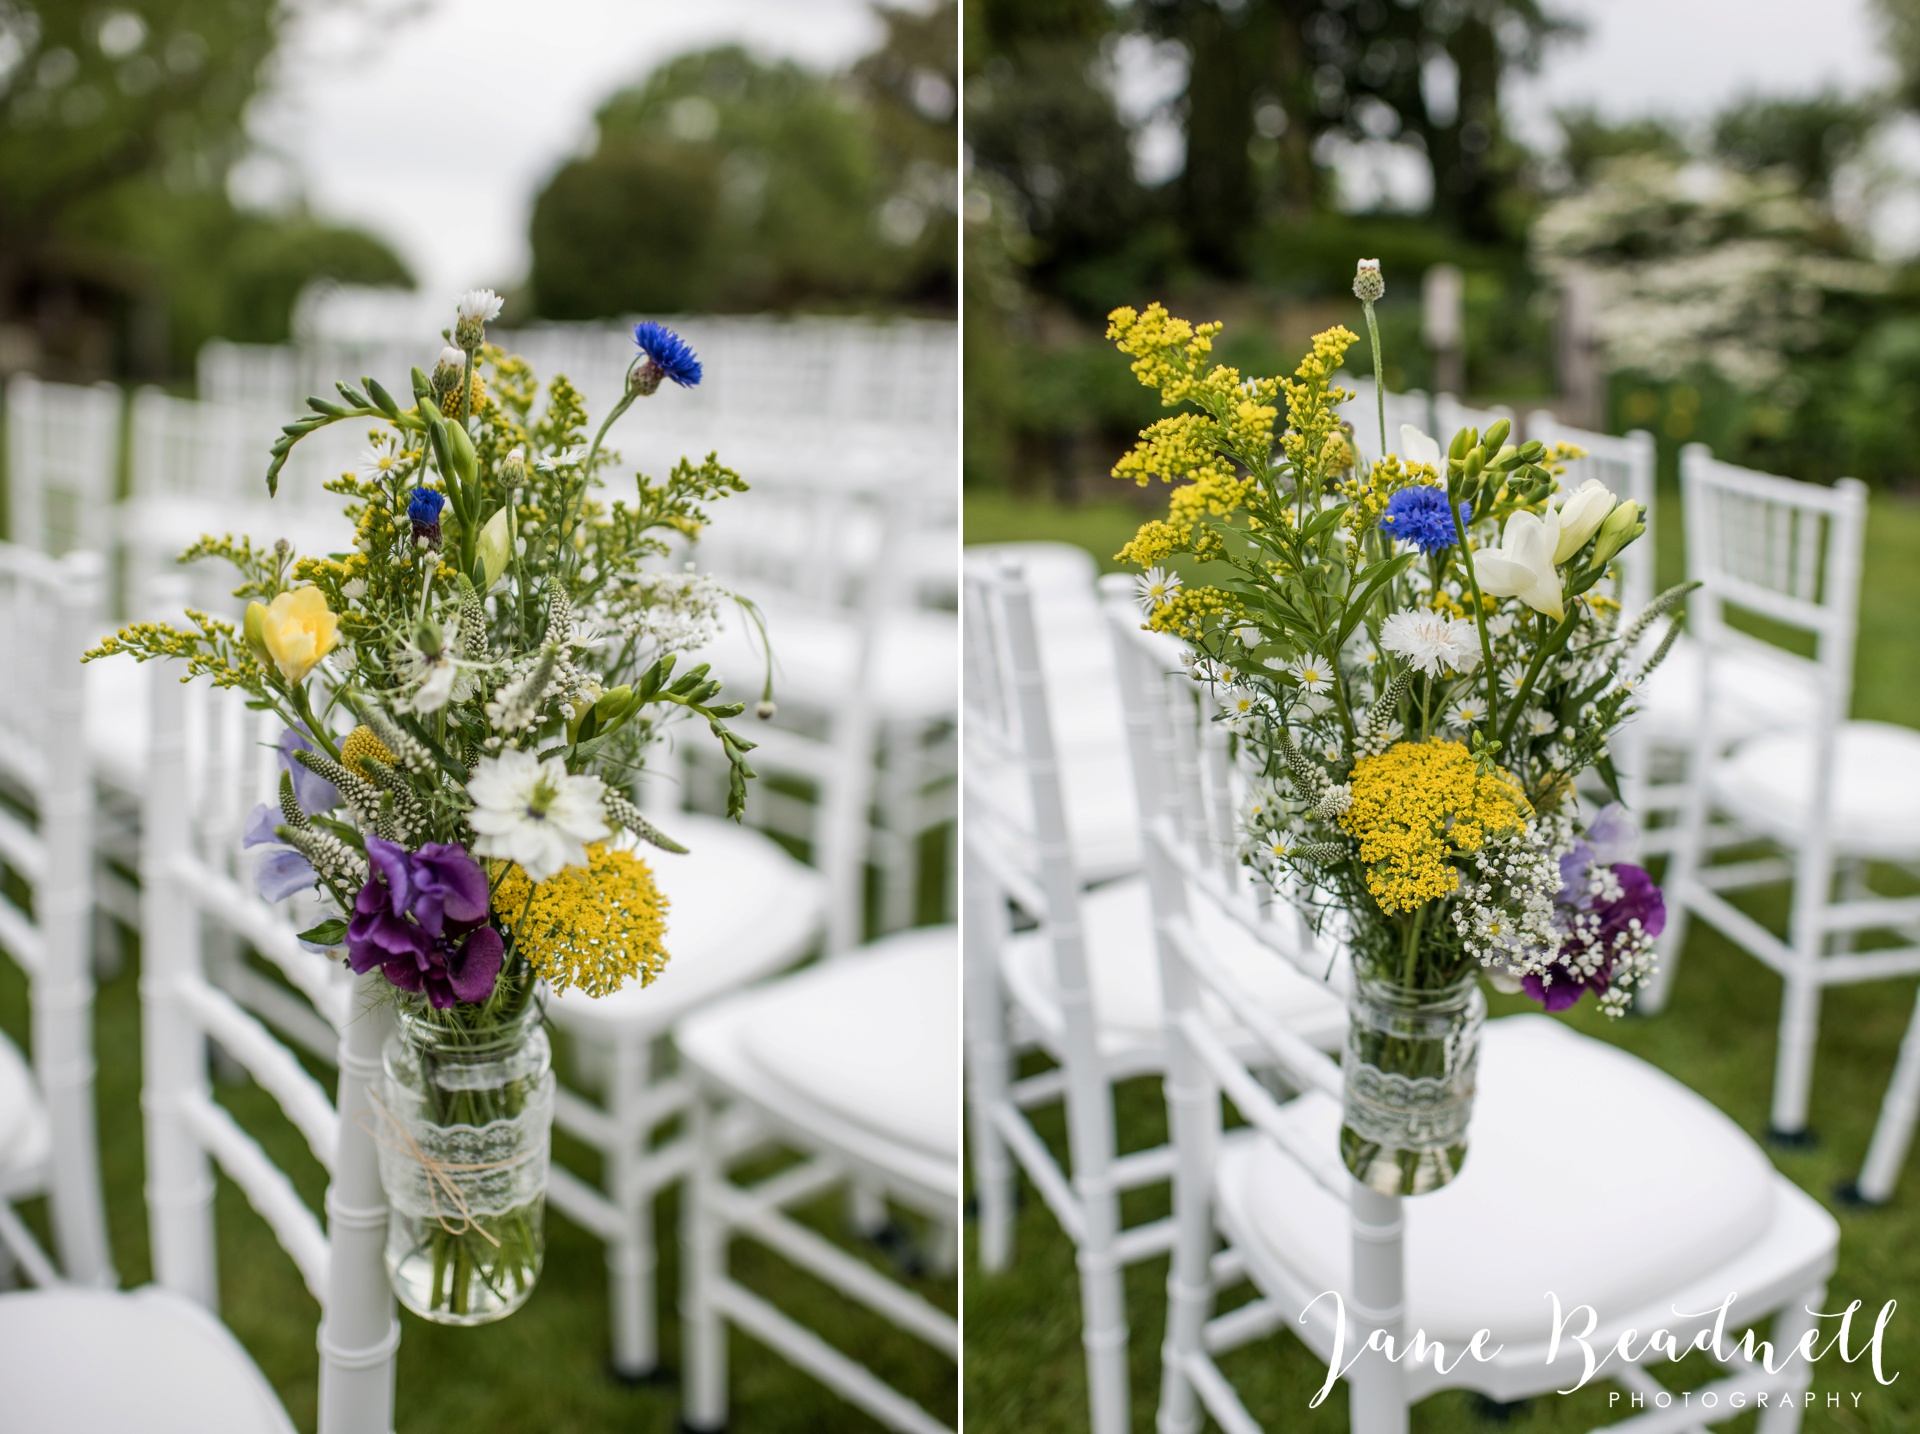 South Farm Wedding photography Hertfordshire by Jane Beadnell Photography fine art wedding photographer_0024